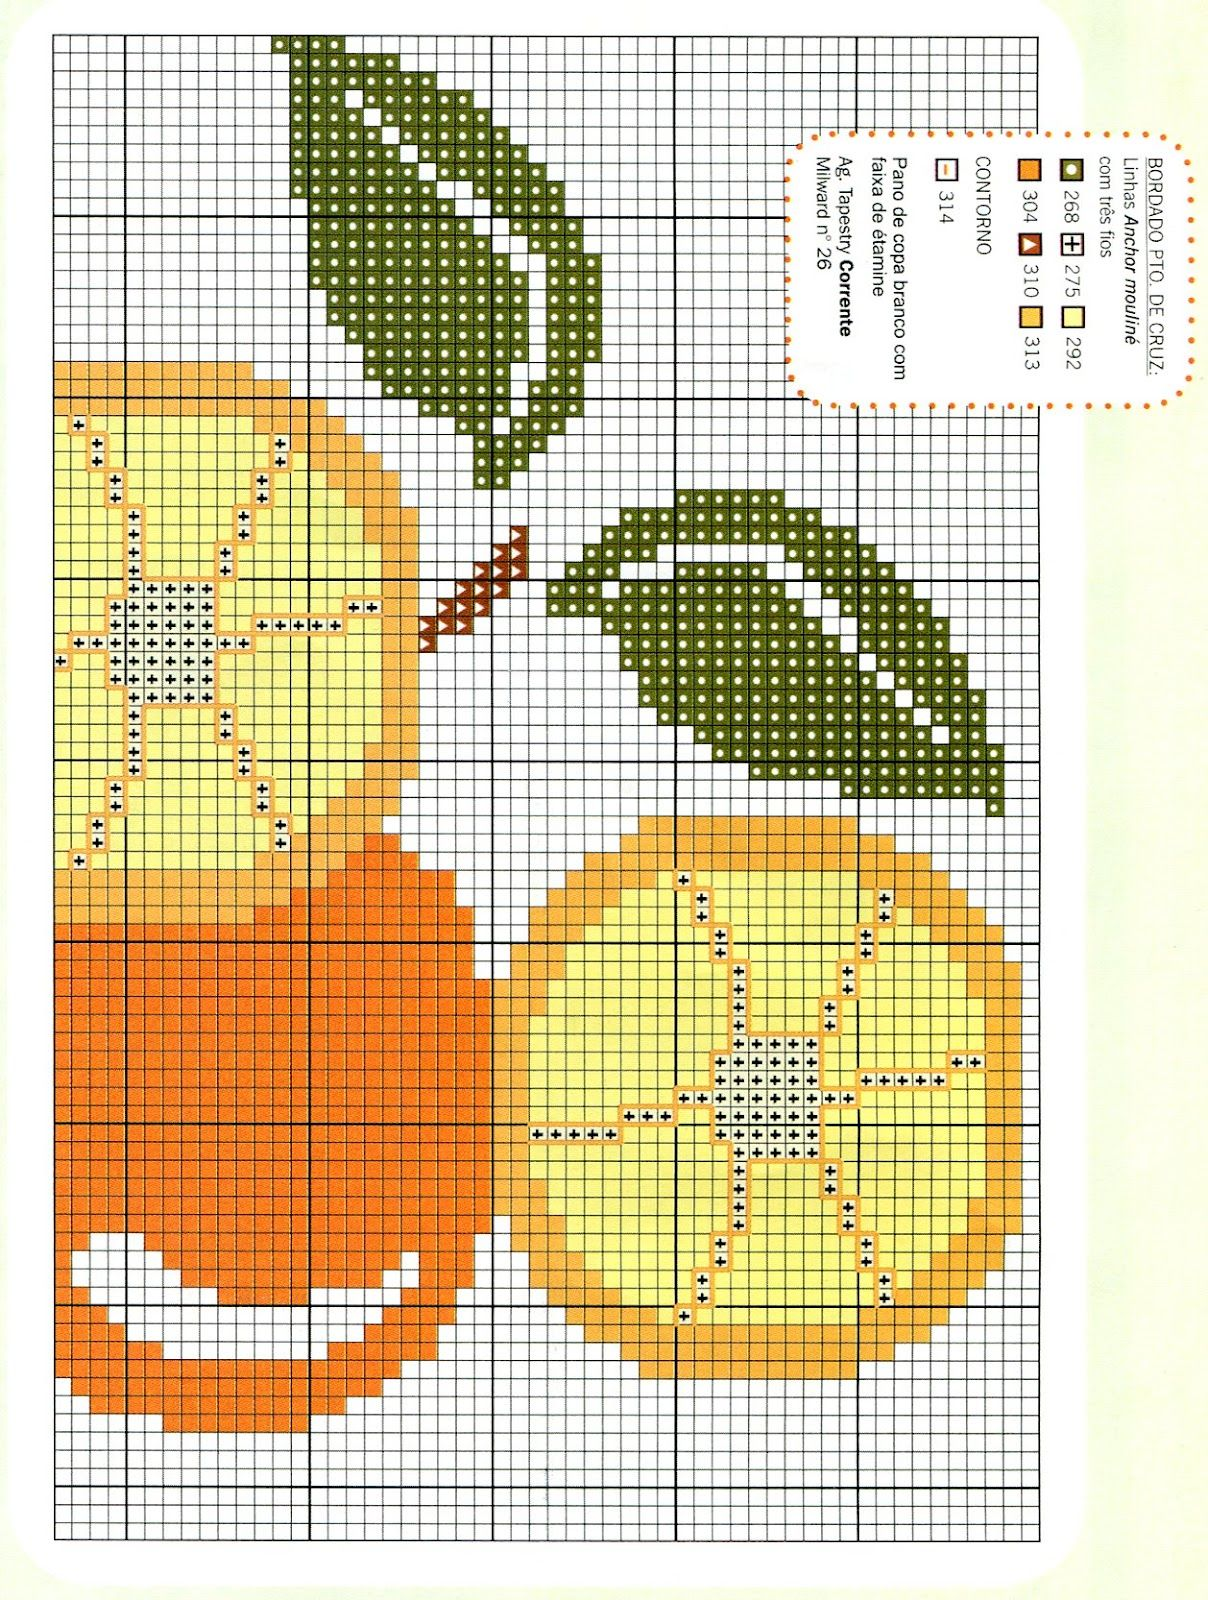 Sandrinha Cross Stitch~Oranges. Repeat pattern for tea towel or bookmark